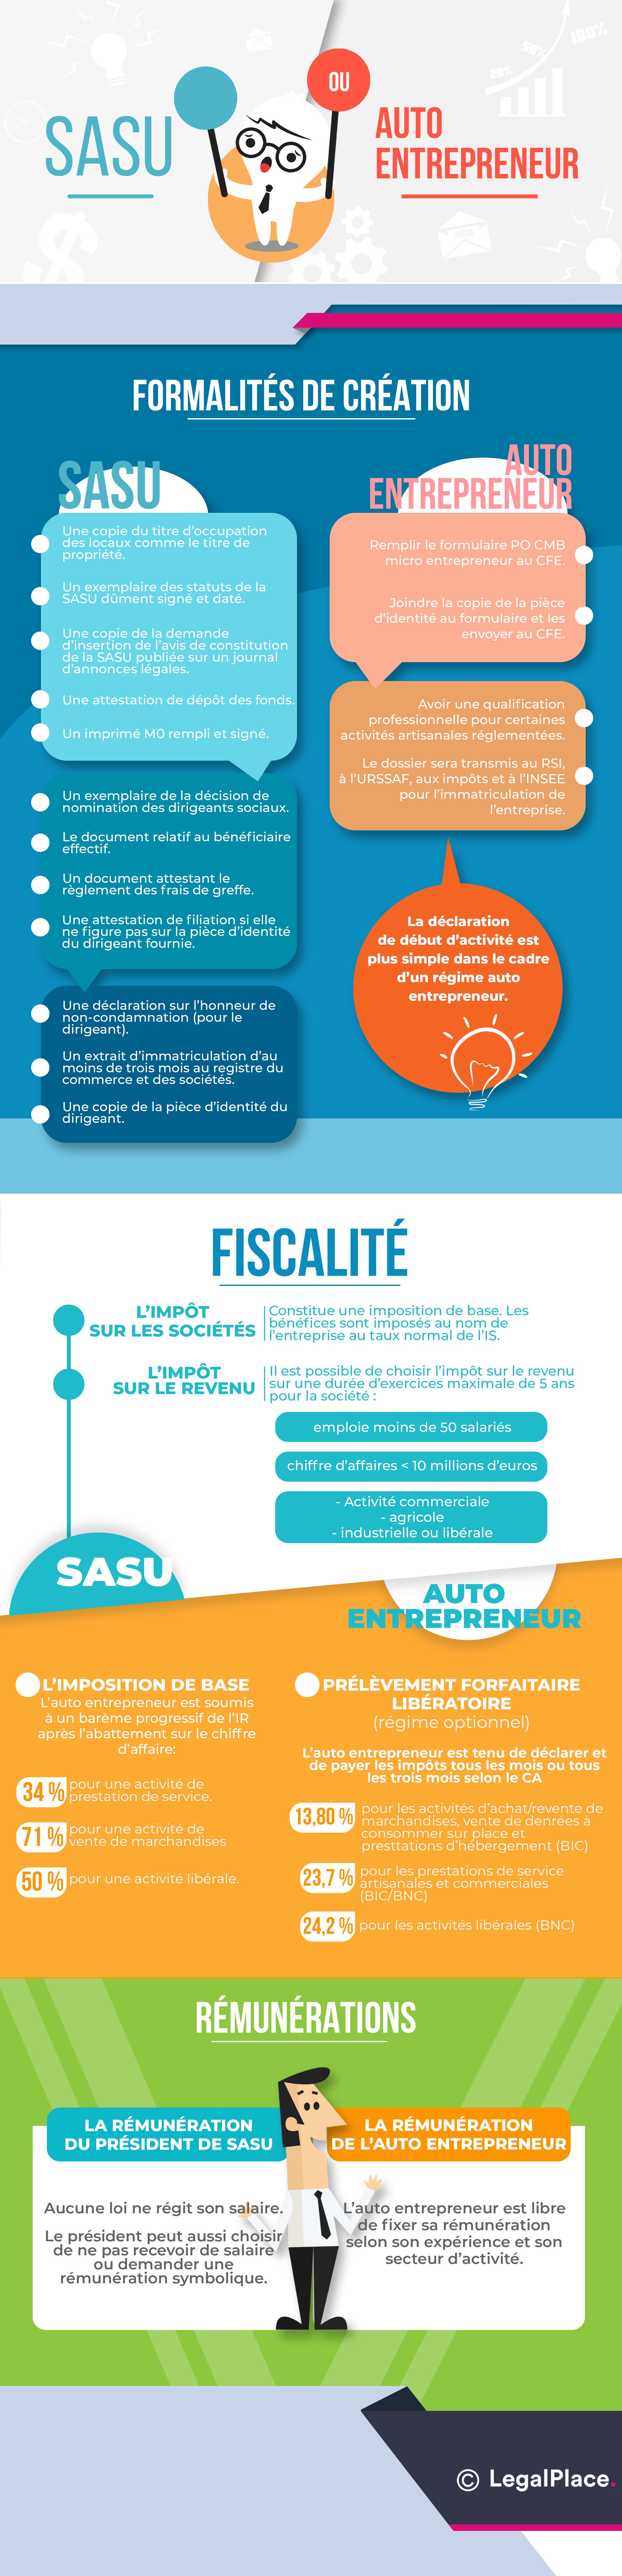 Infographie - SASU ou auto-entrepreneur